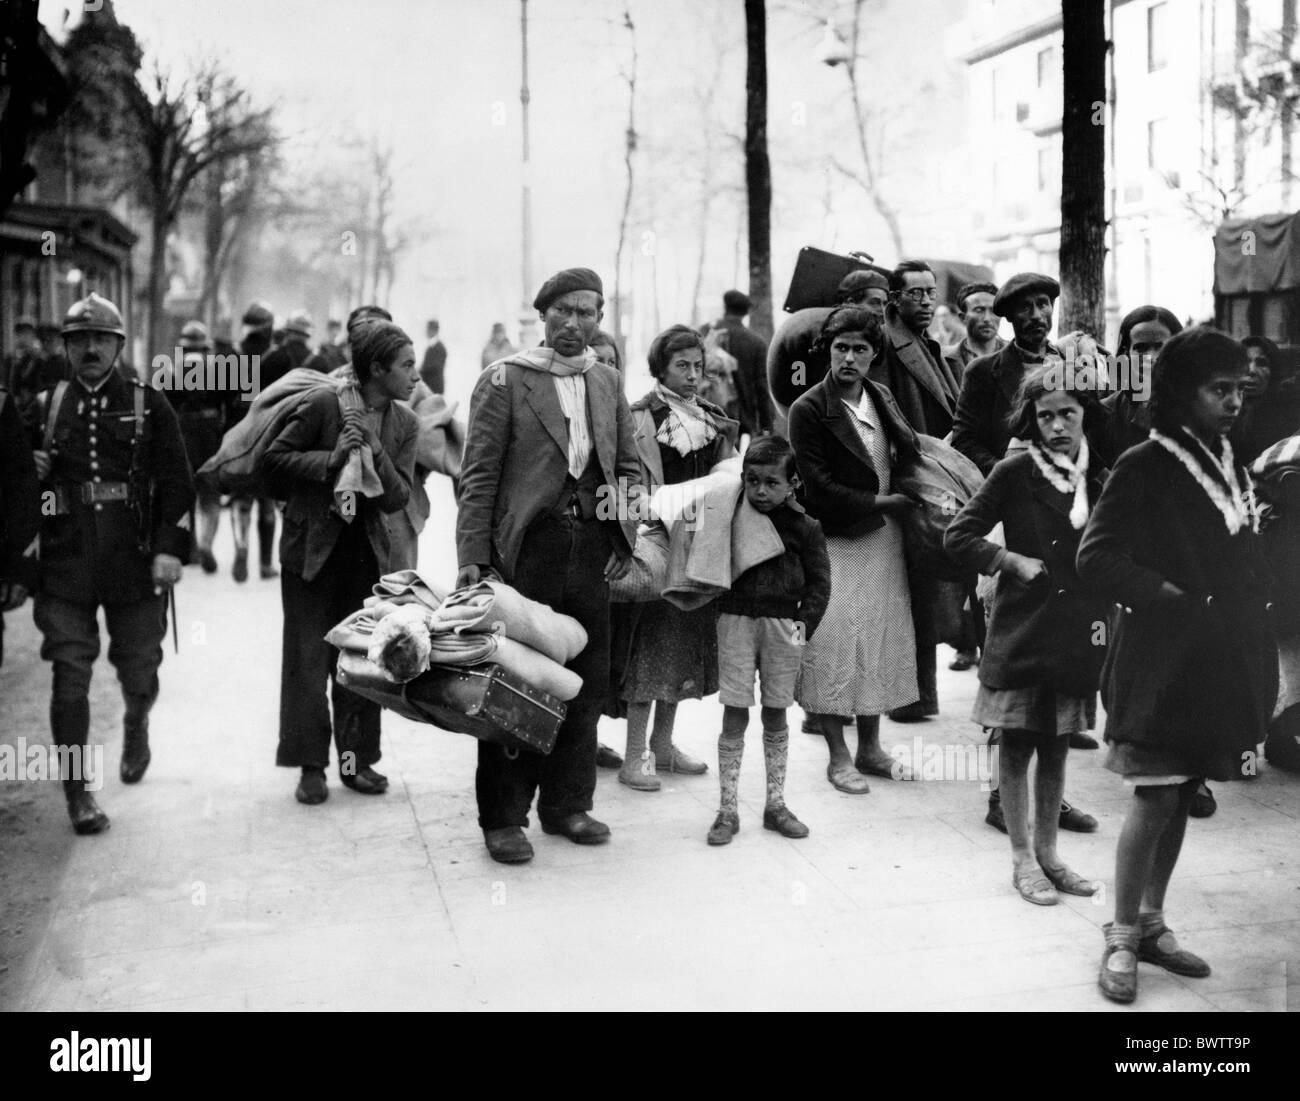 Europa España Guerra Civil Española historia histórica histórica refugiados Luchon France Europe Imagen De Stock